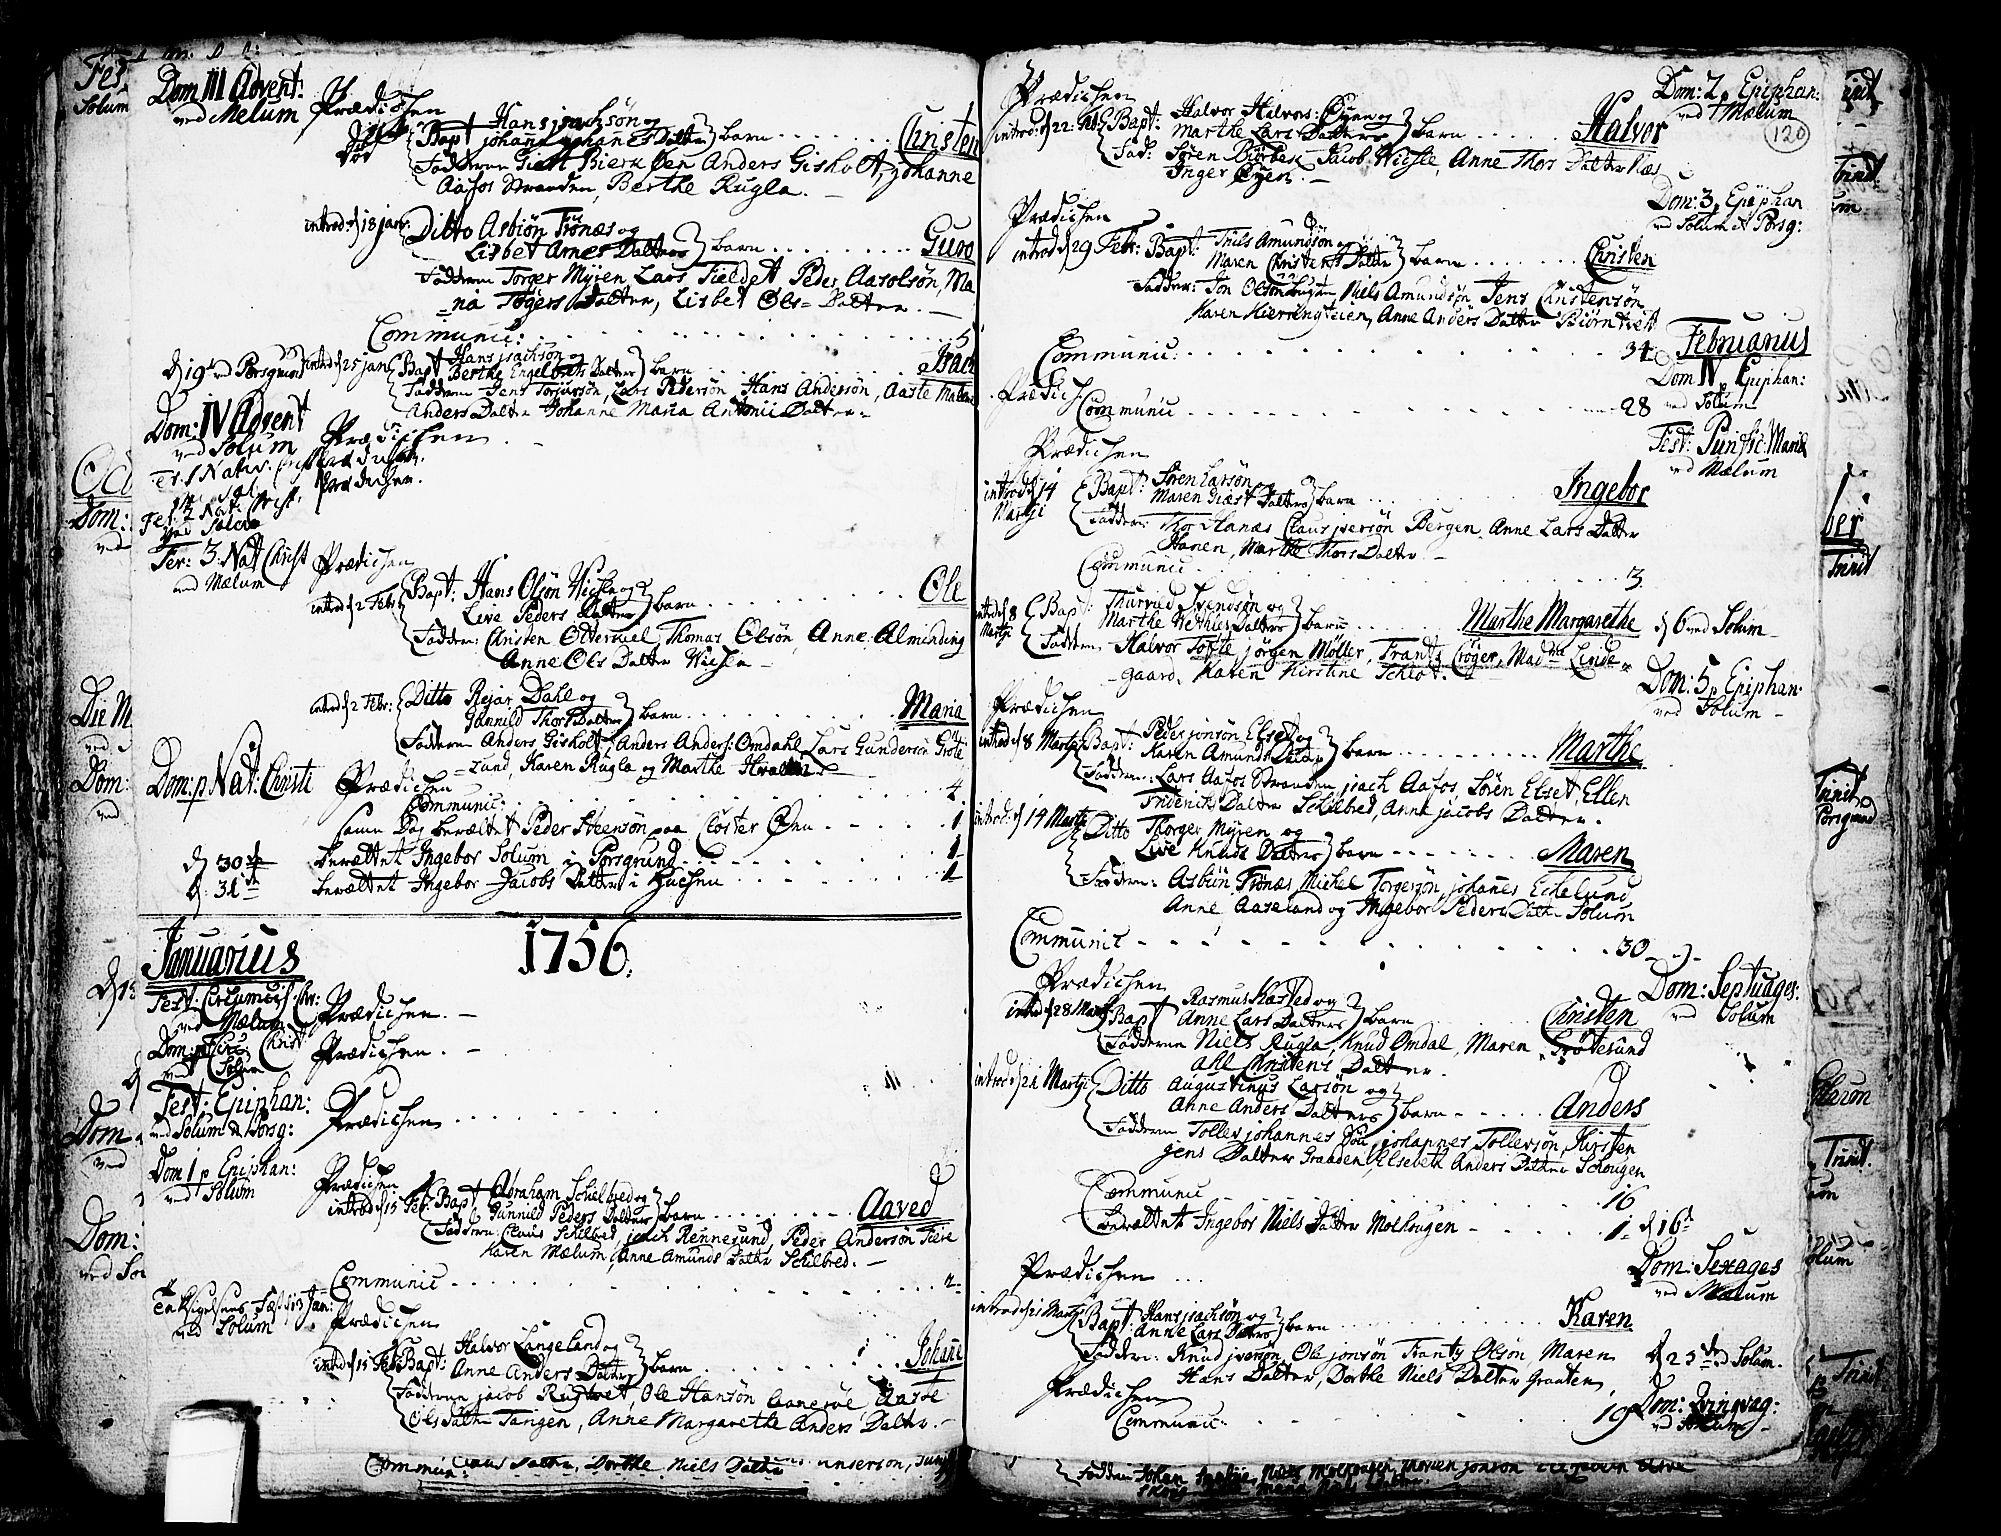 SAKO, Solum kirkebøker, F/Fa/L0002: Ministerialbok nr. I 2, 1713-1761, s. 120